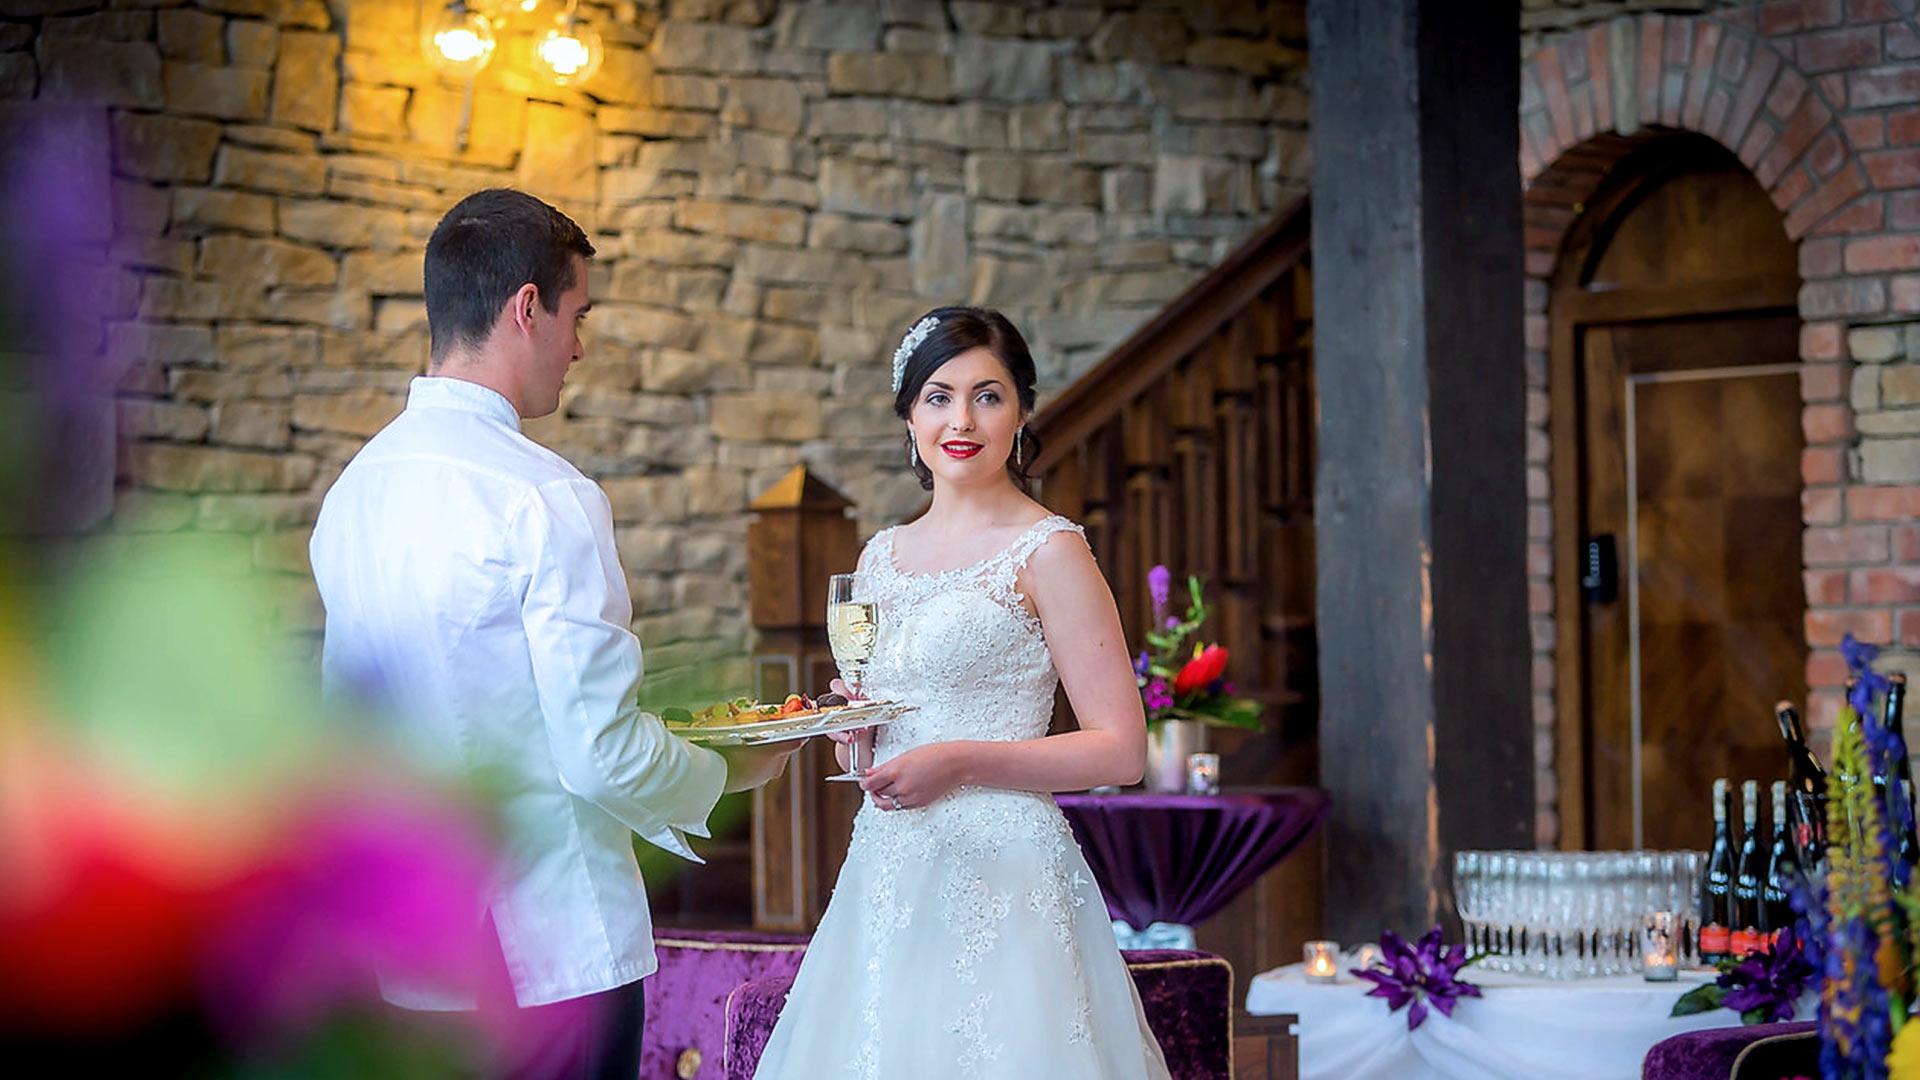 Our Stunning Balavaun Suite Set For A Wedding